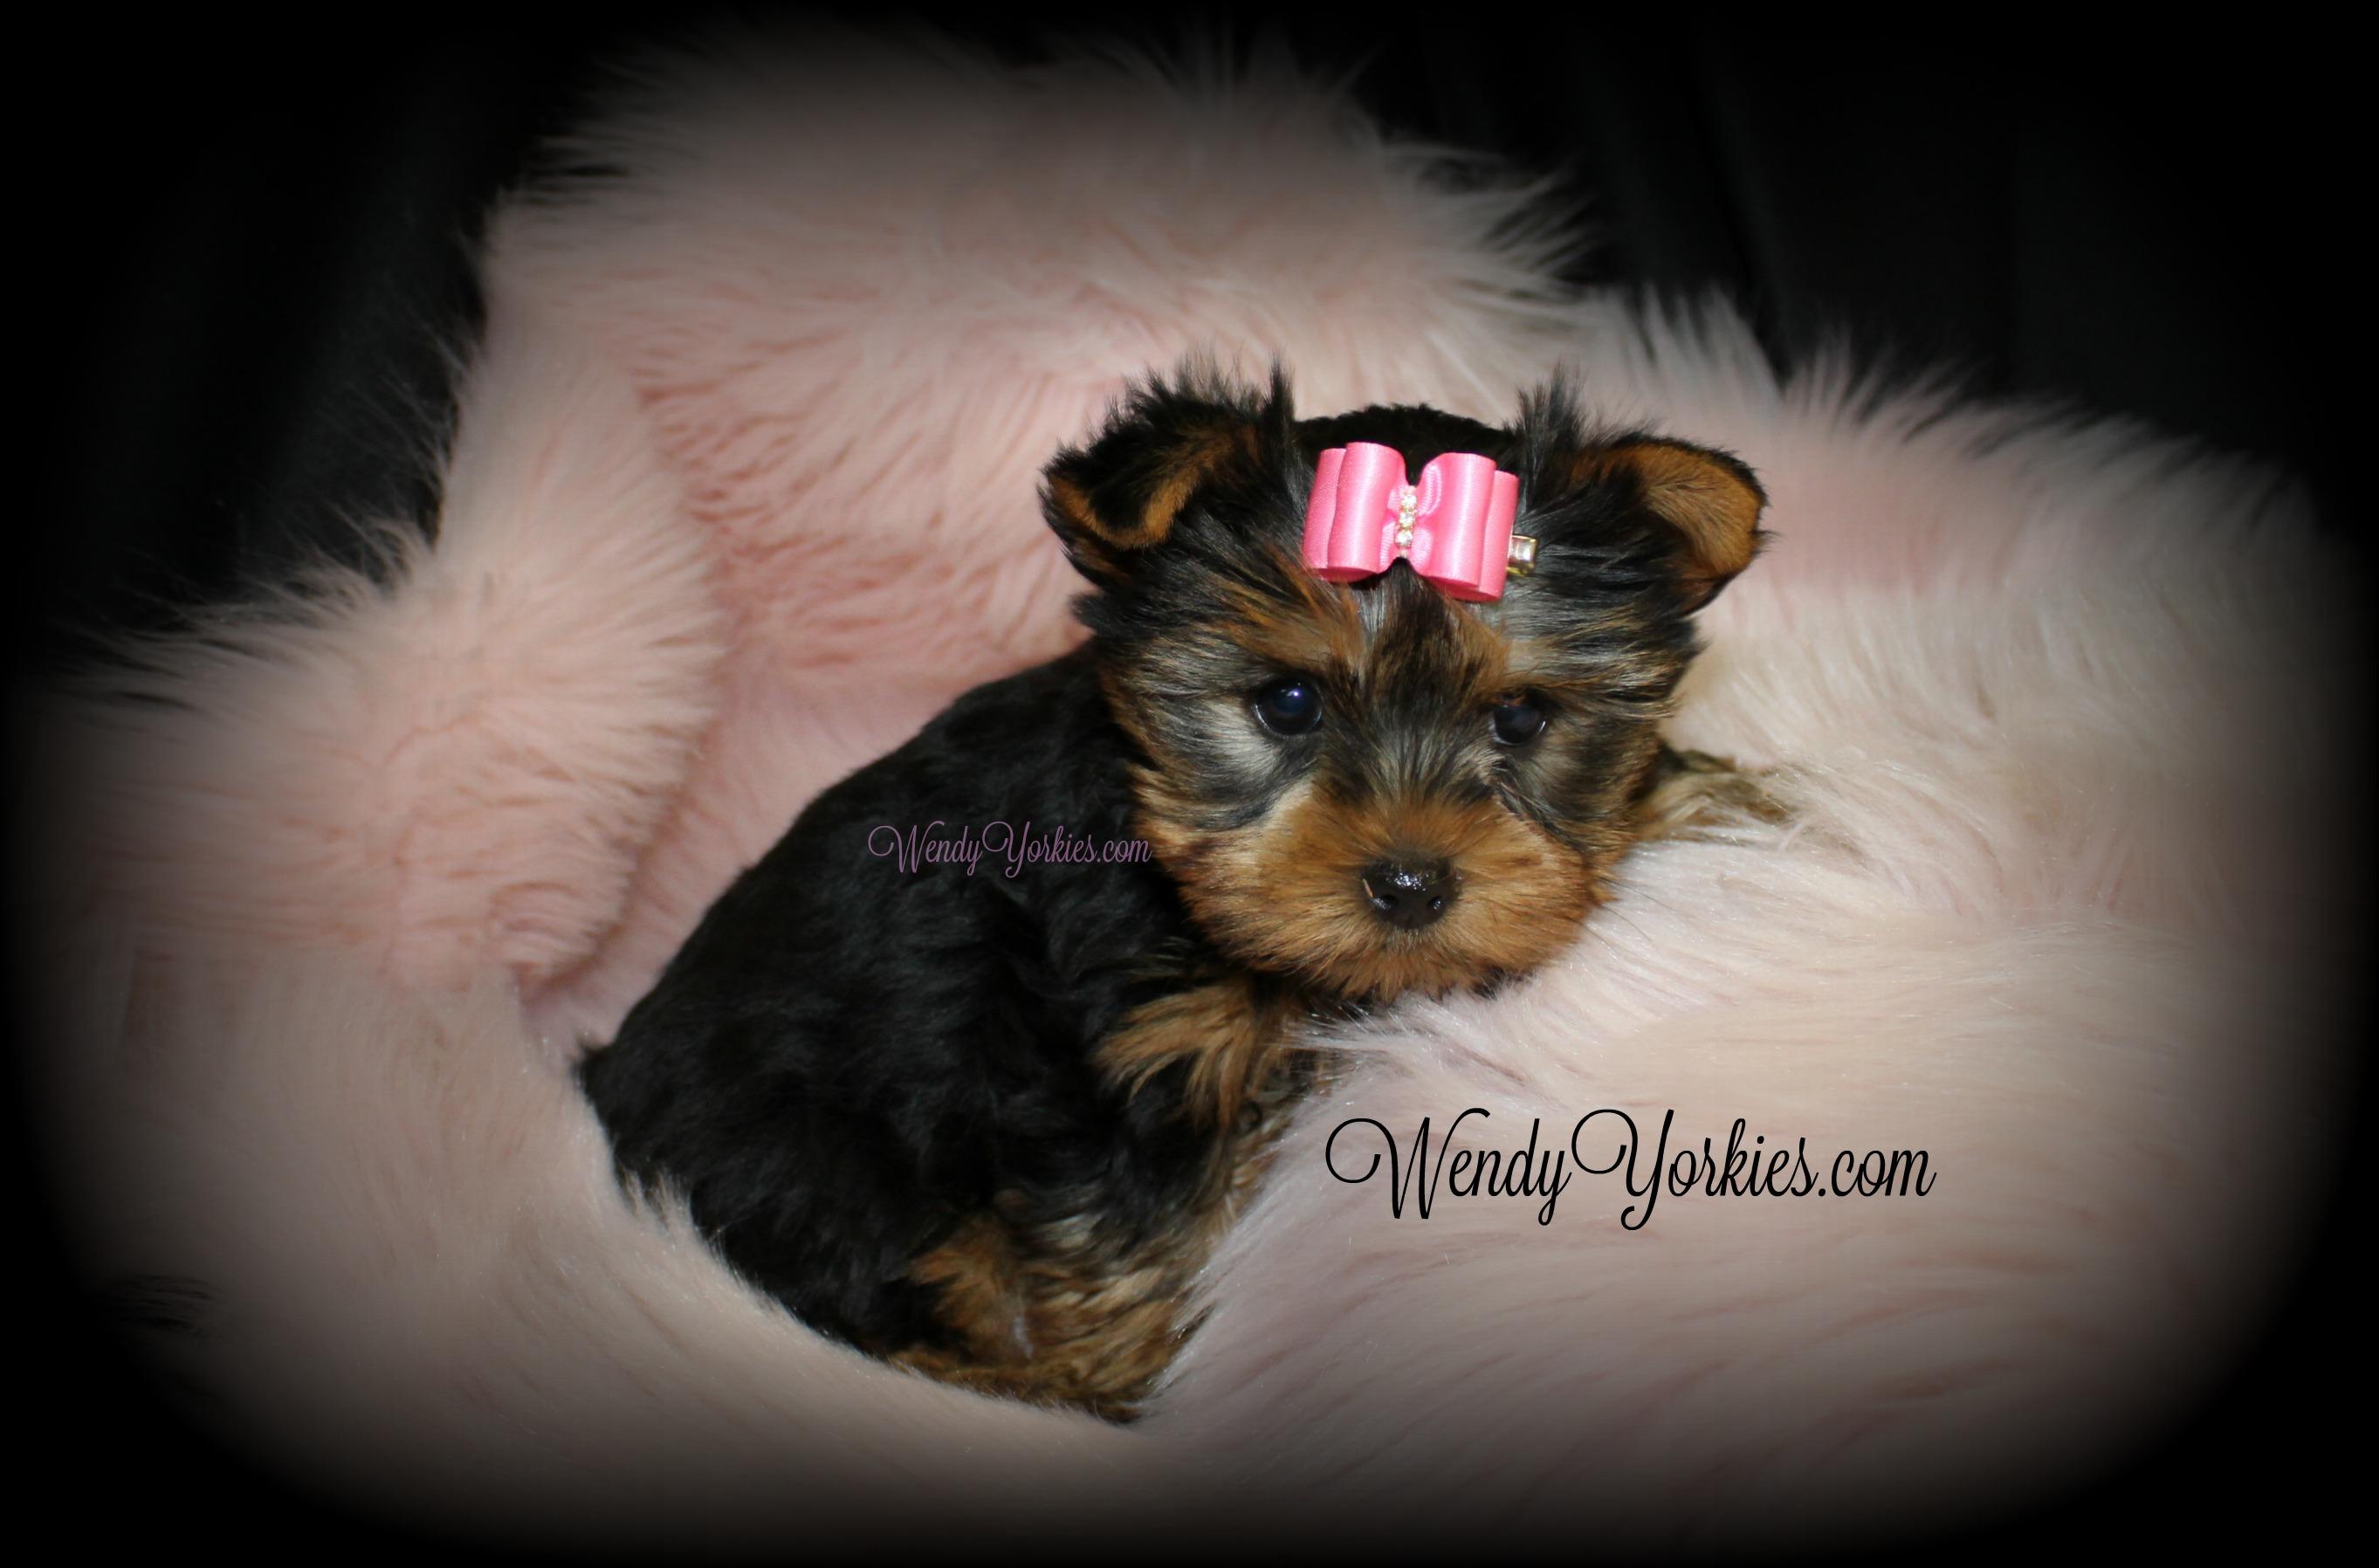 WendysYorkies.com, Female Teacup Yorkie puppy for sale, Star f1